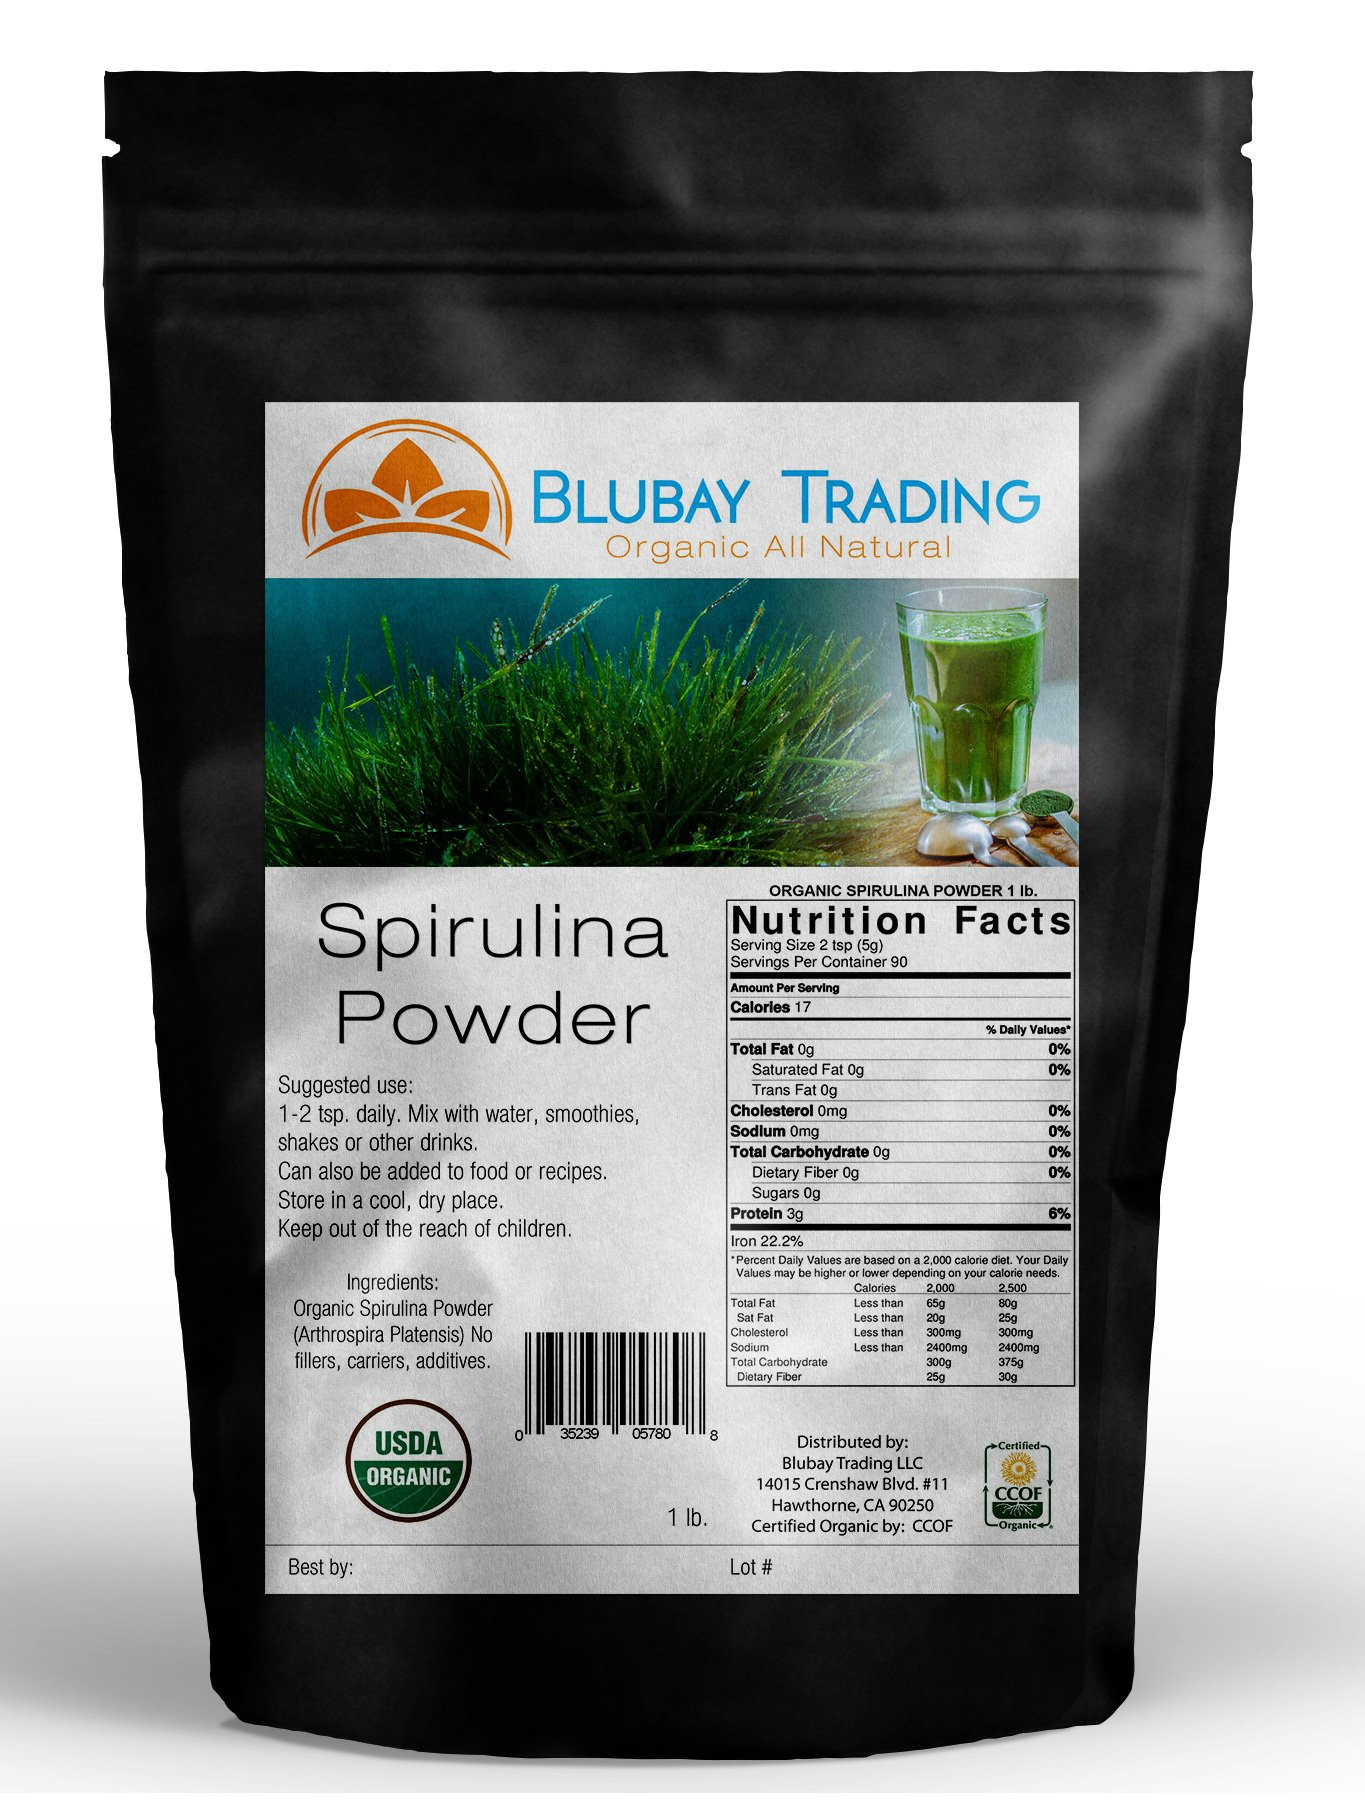 5 lb ORGANIC SPIRULINA POWDER 100% PURE NON-GMO ~ WHOLESALE ENERGY WEIGHT LOSS